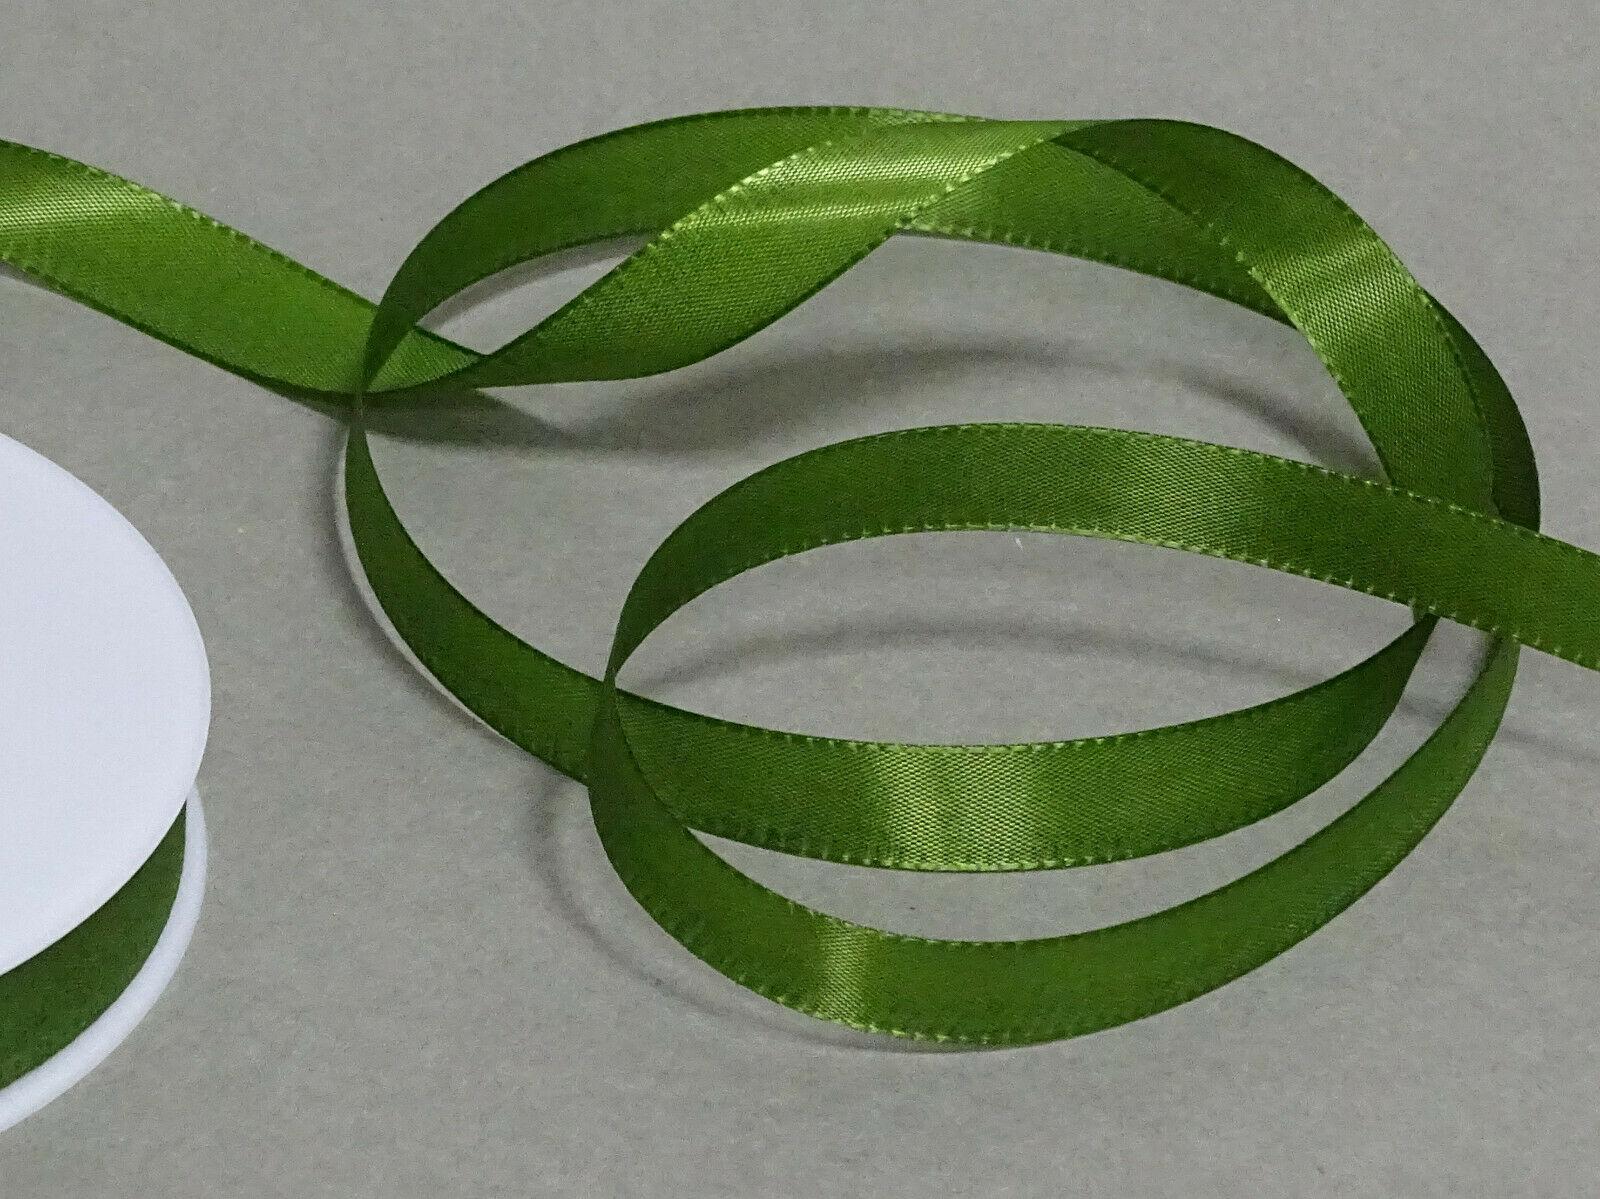 Seidenband Schleifenband 50 m x 15 mm / 40 mm Dekoband ab 0,08 €/m Geschenkband  - Olivgrün 111, 40 mm x 50 m